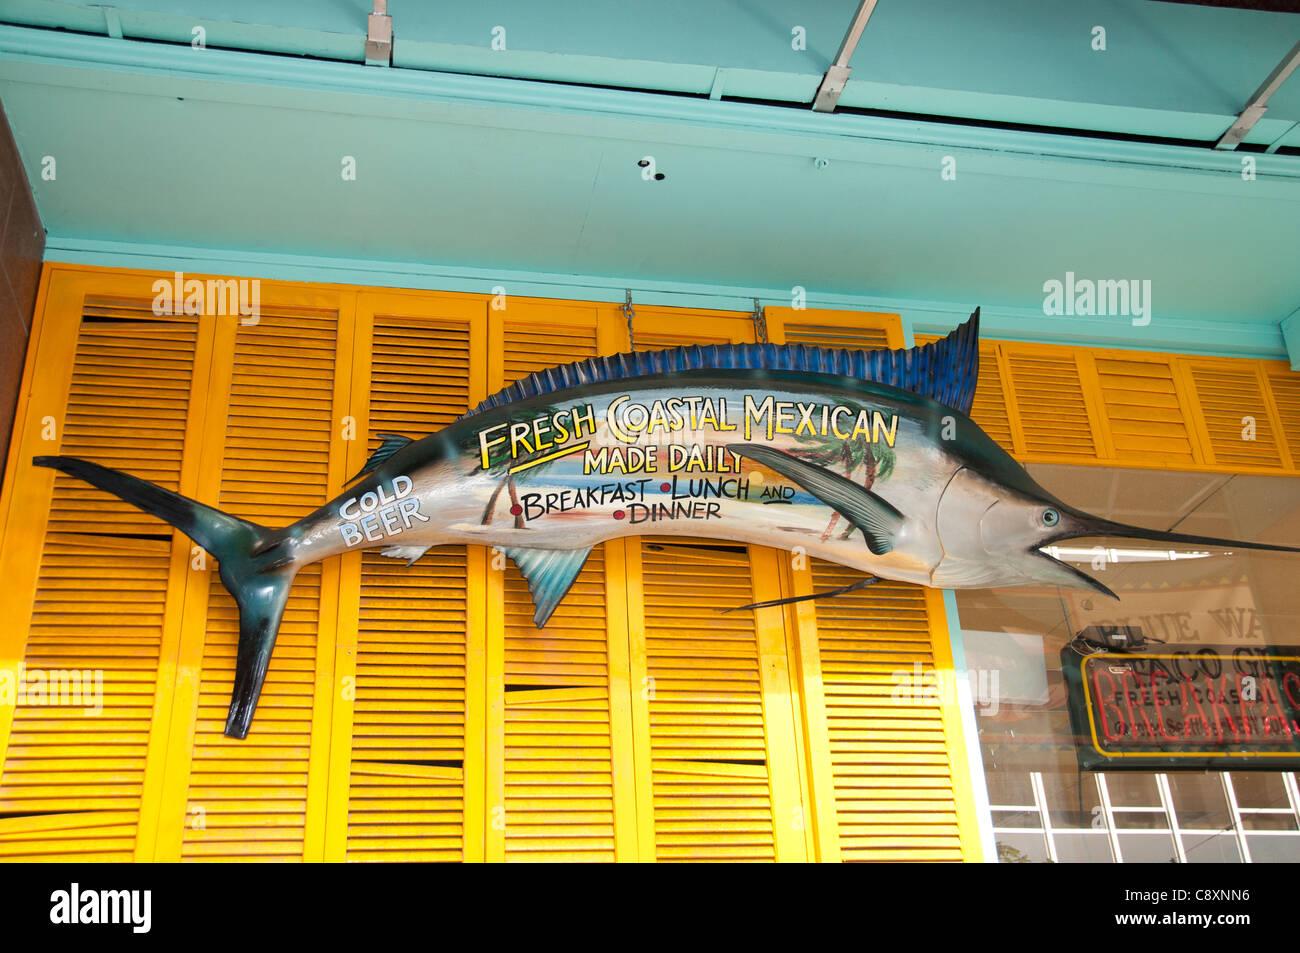 Restaurant  Fresh Coastal Mexican Pub Bar fish Seattle Town City Washington United States - Stock Image